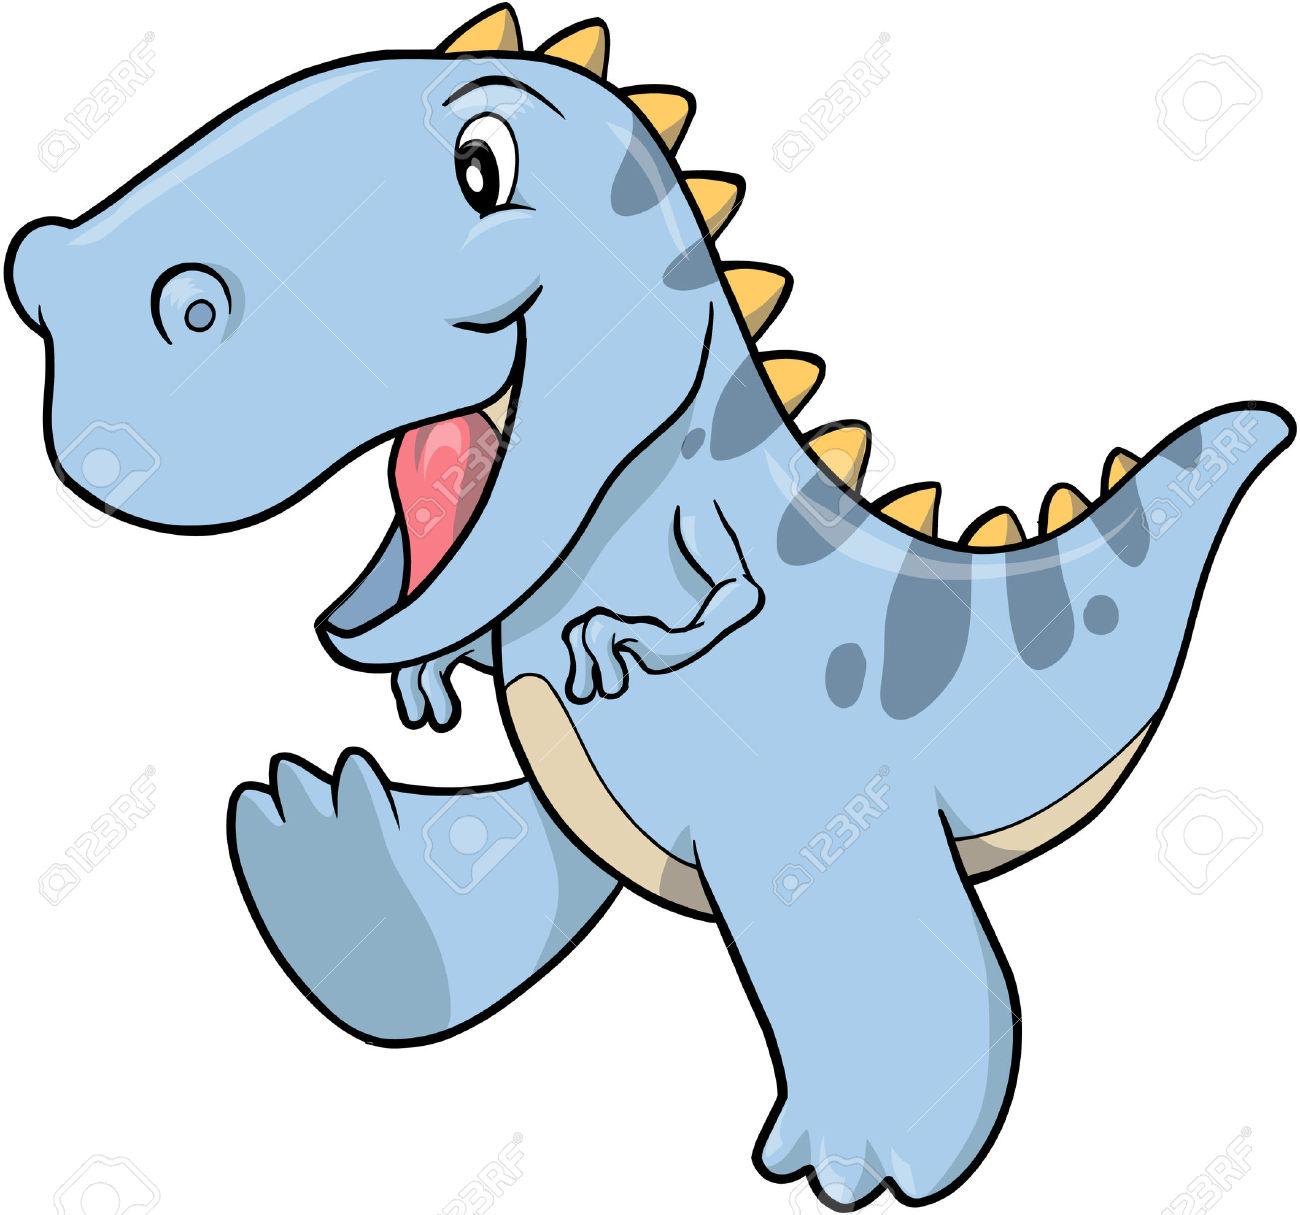 1300x1215 Tyrannosaurus Rex Clipart Cute Flying Dinosaur